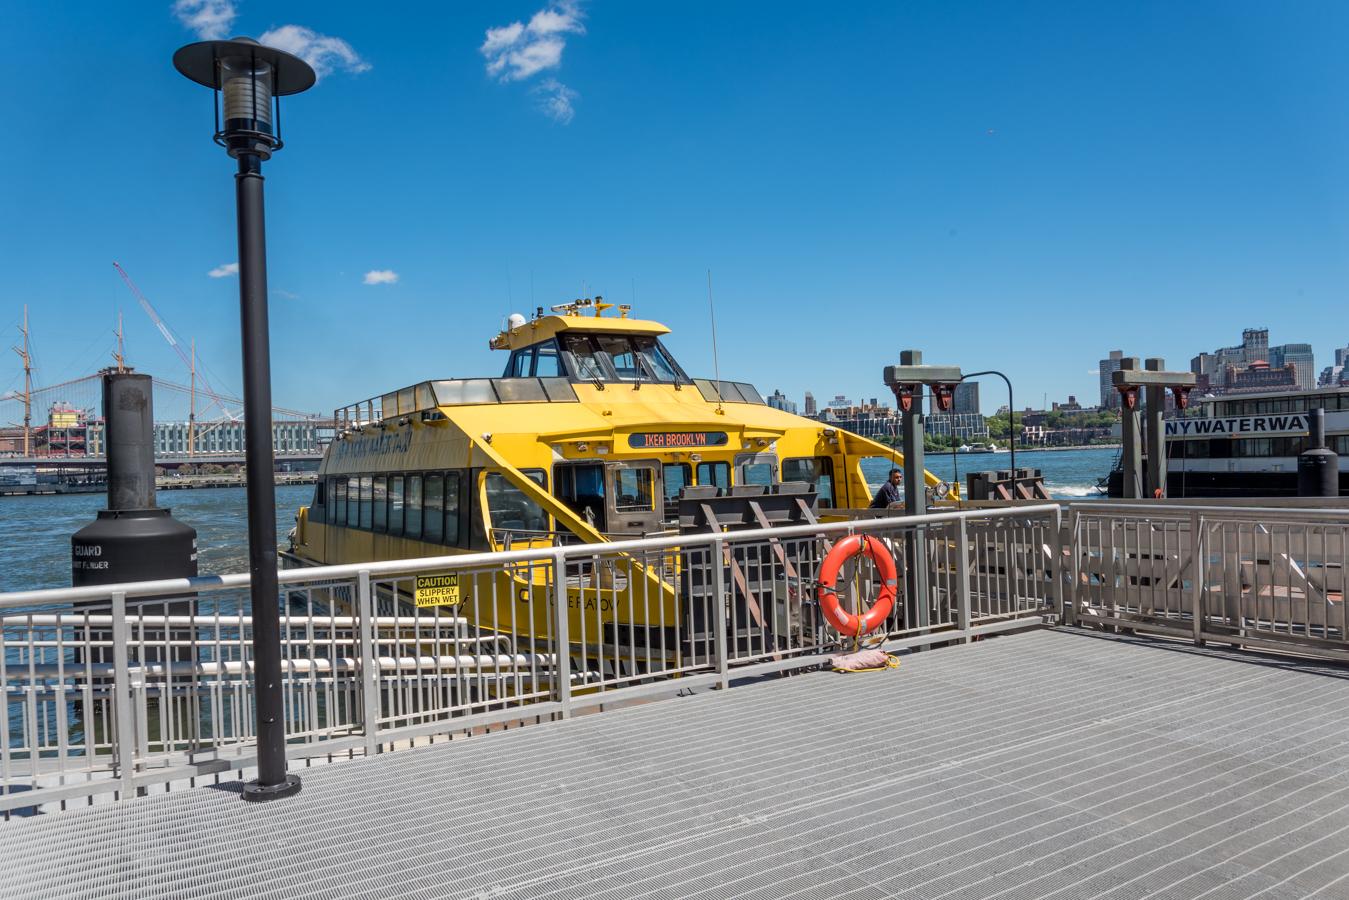 Rock Mama NYC lifestyle blog-New York Water Taxi - IKEA Express